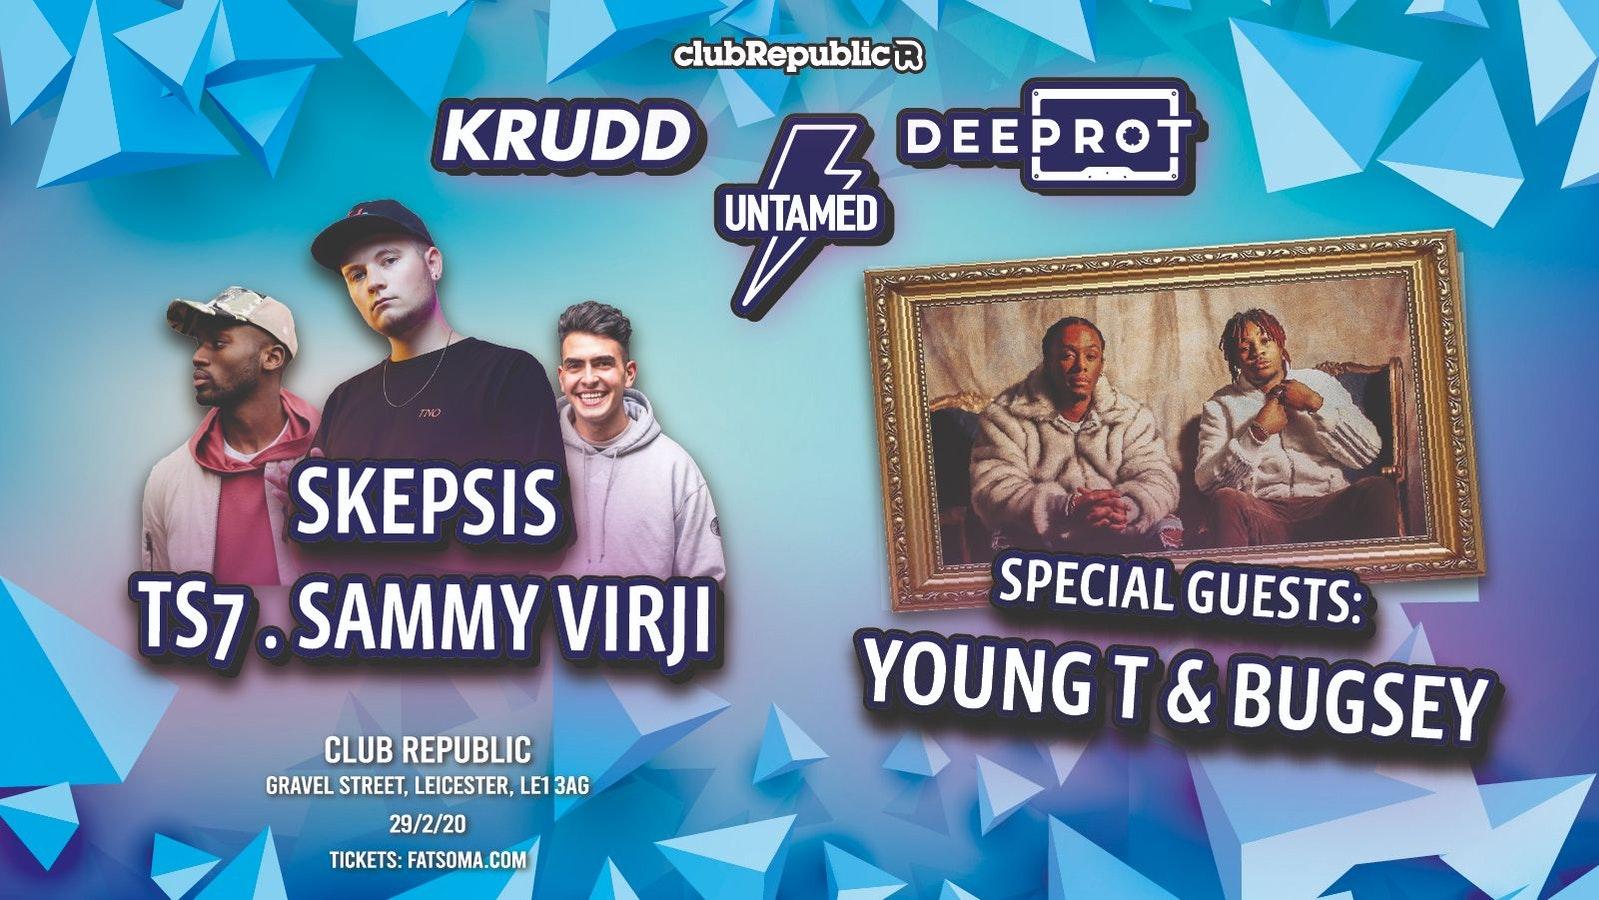 Untamed x Krudd x Deeprot Present: Skepsis, TS7, Sammy Virji // Special Guests Young T & Bugsey